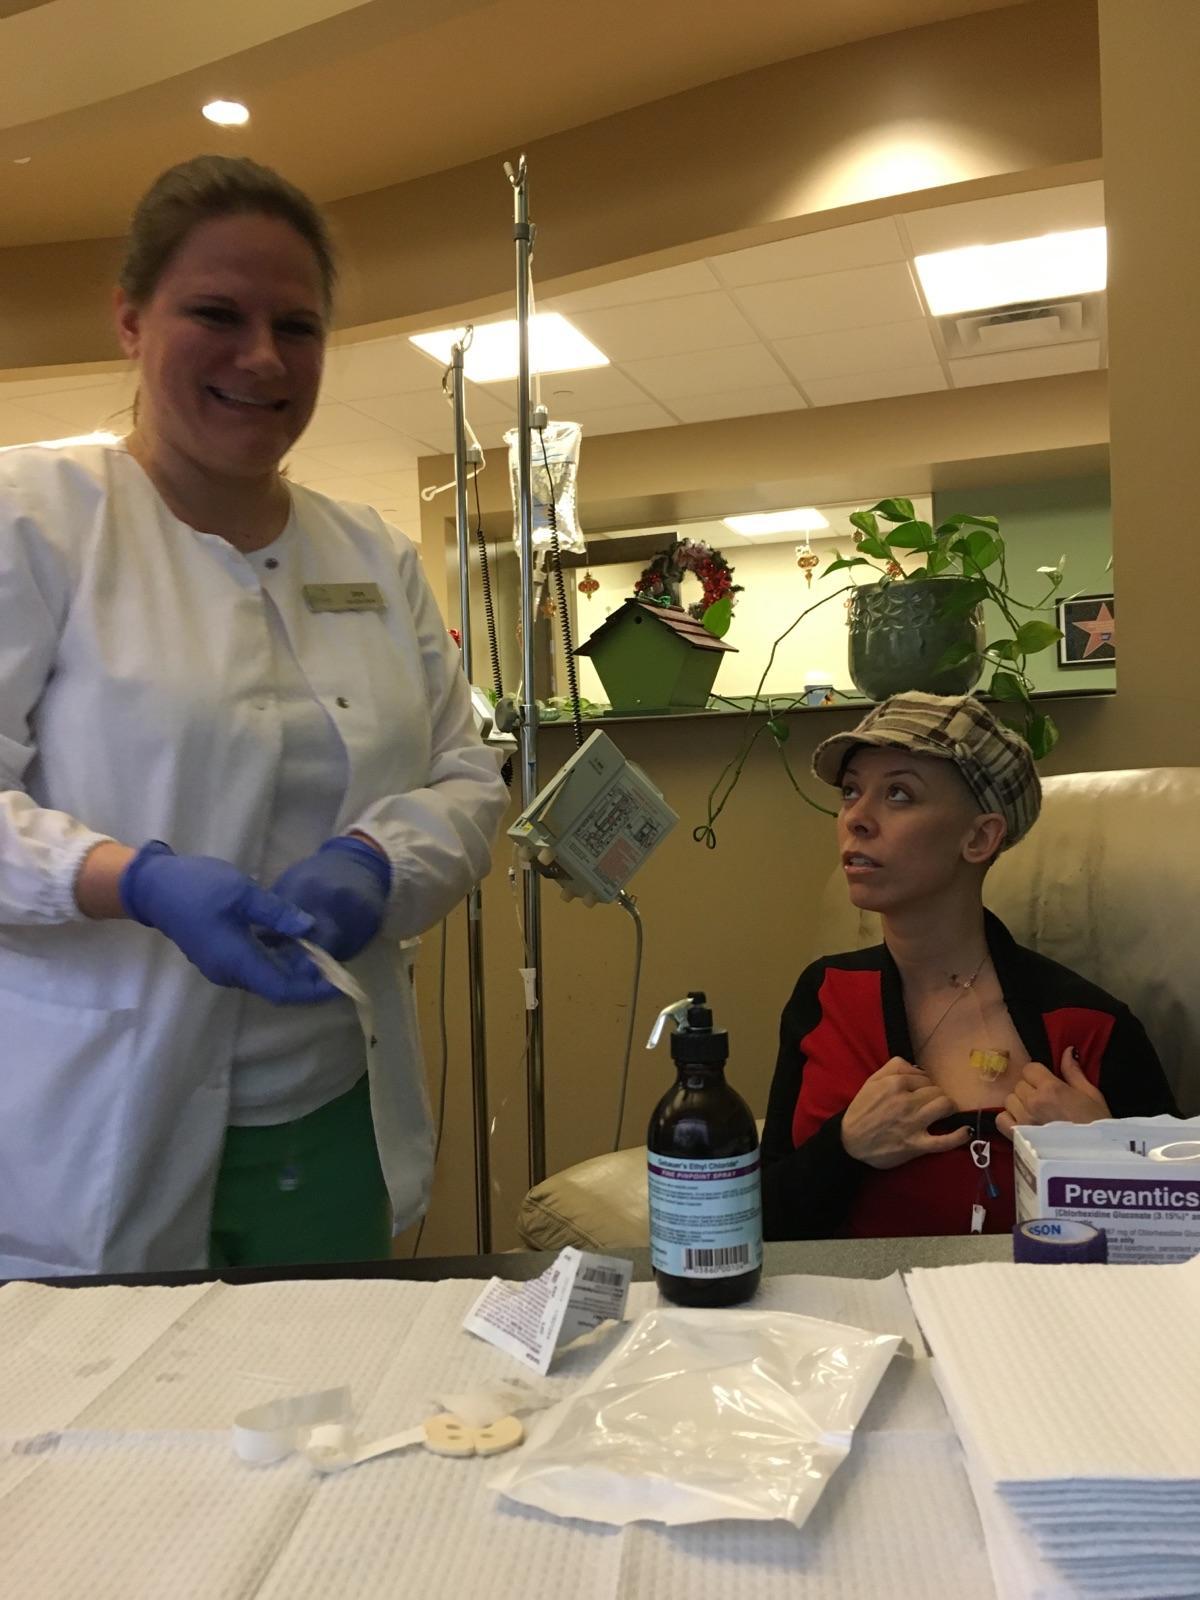 (16-01-07) Chemo Session#2